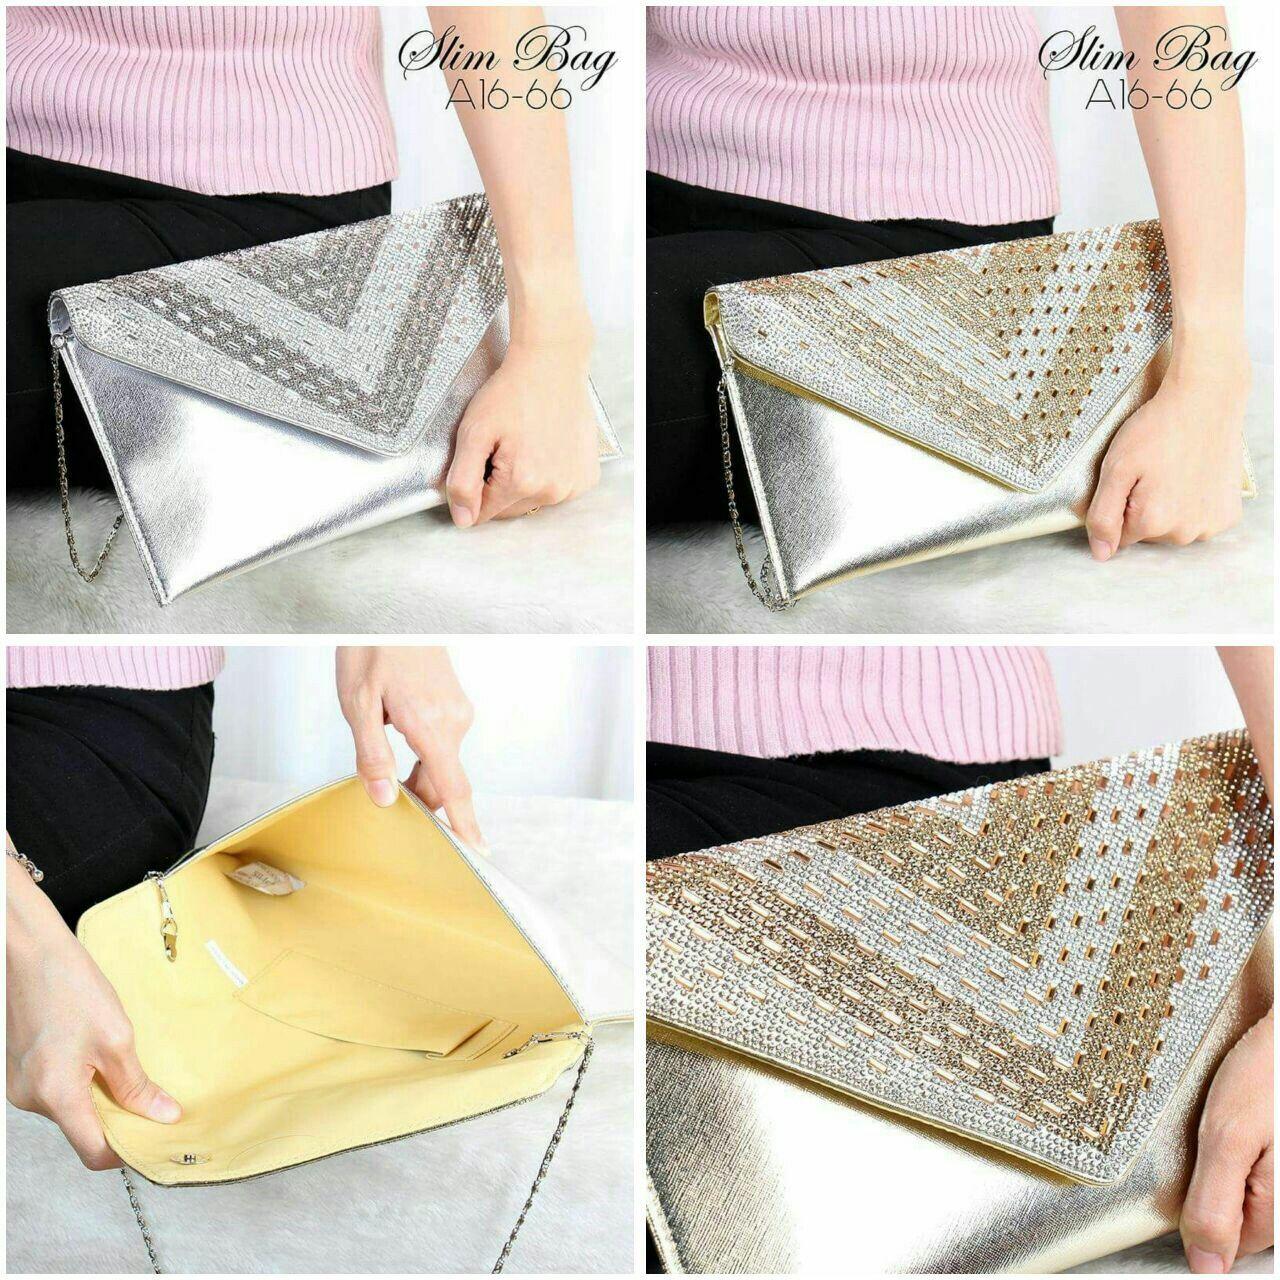 93b9e692d87 Clutch Party Bag Swarovsky A16-66  Leather Waterproof Quality Semi Ori  29×